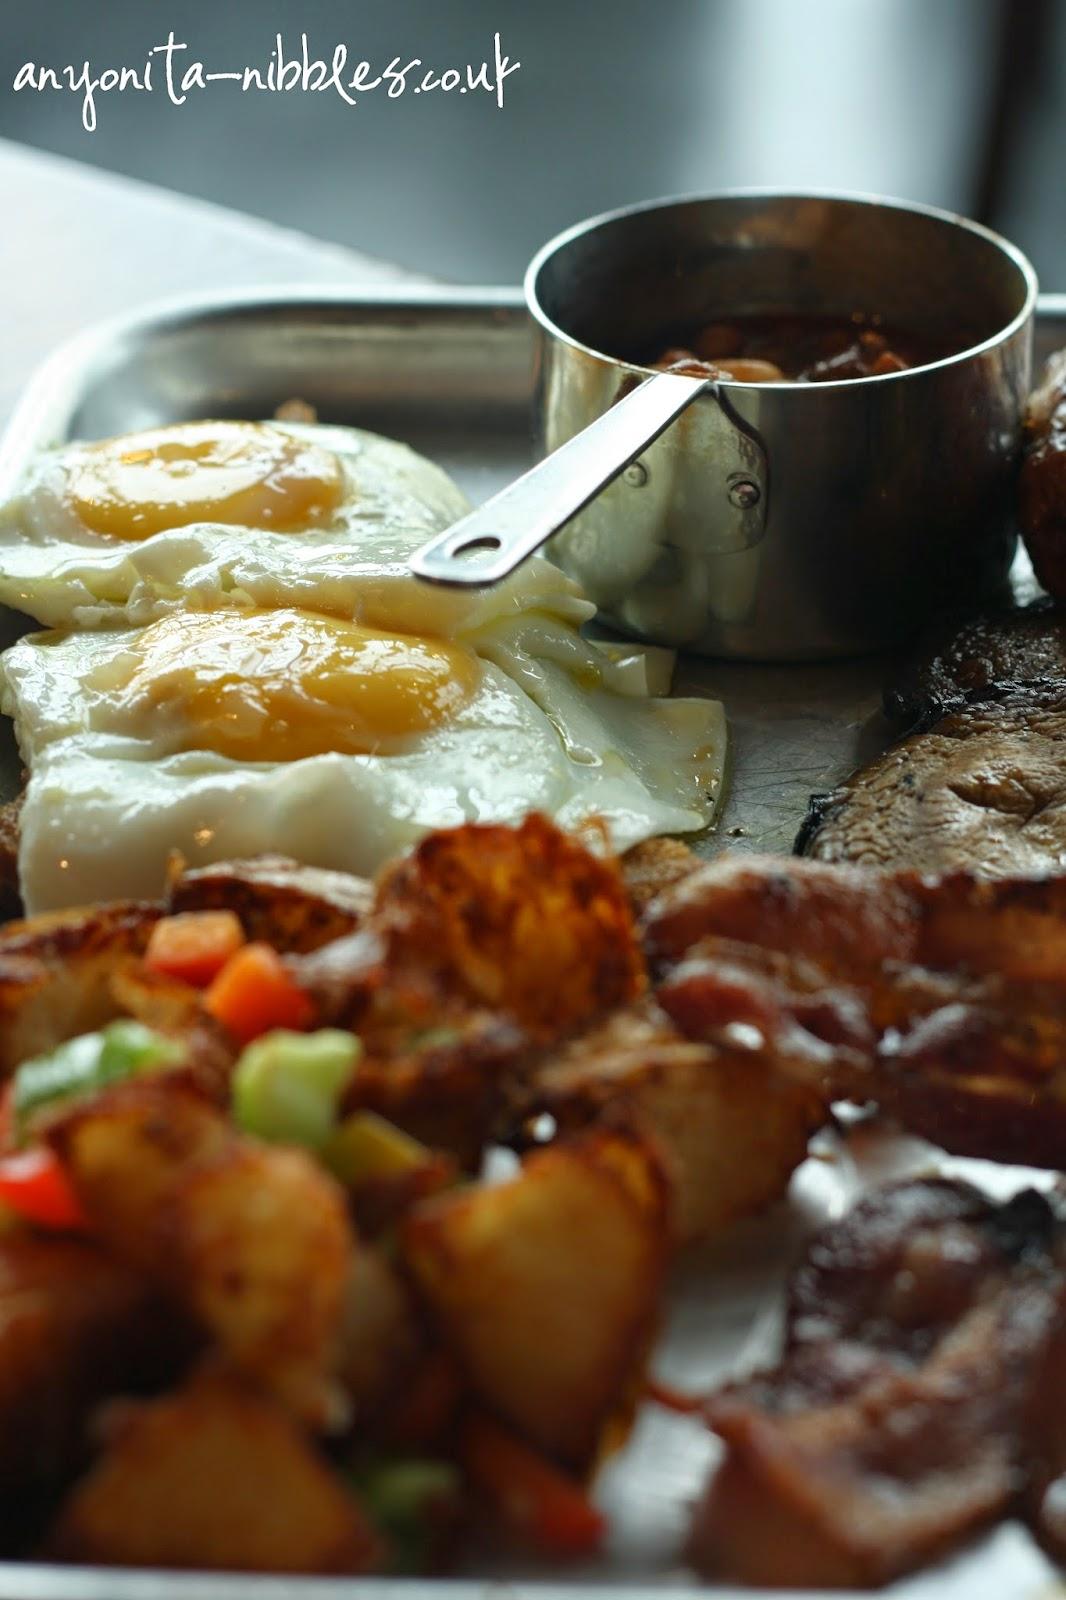 The Jack Daniel's American Breakfast from TGI Friday's | Anyonita-nibbles.co.uk